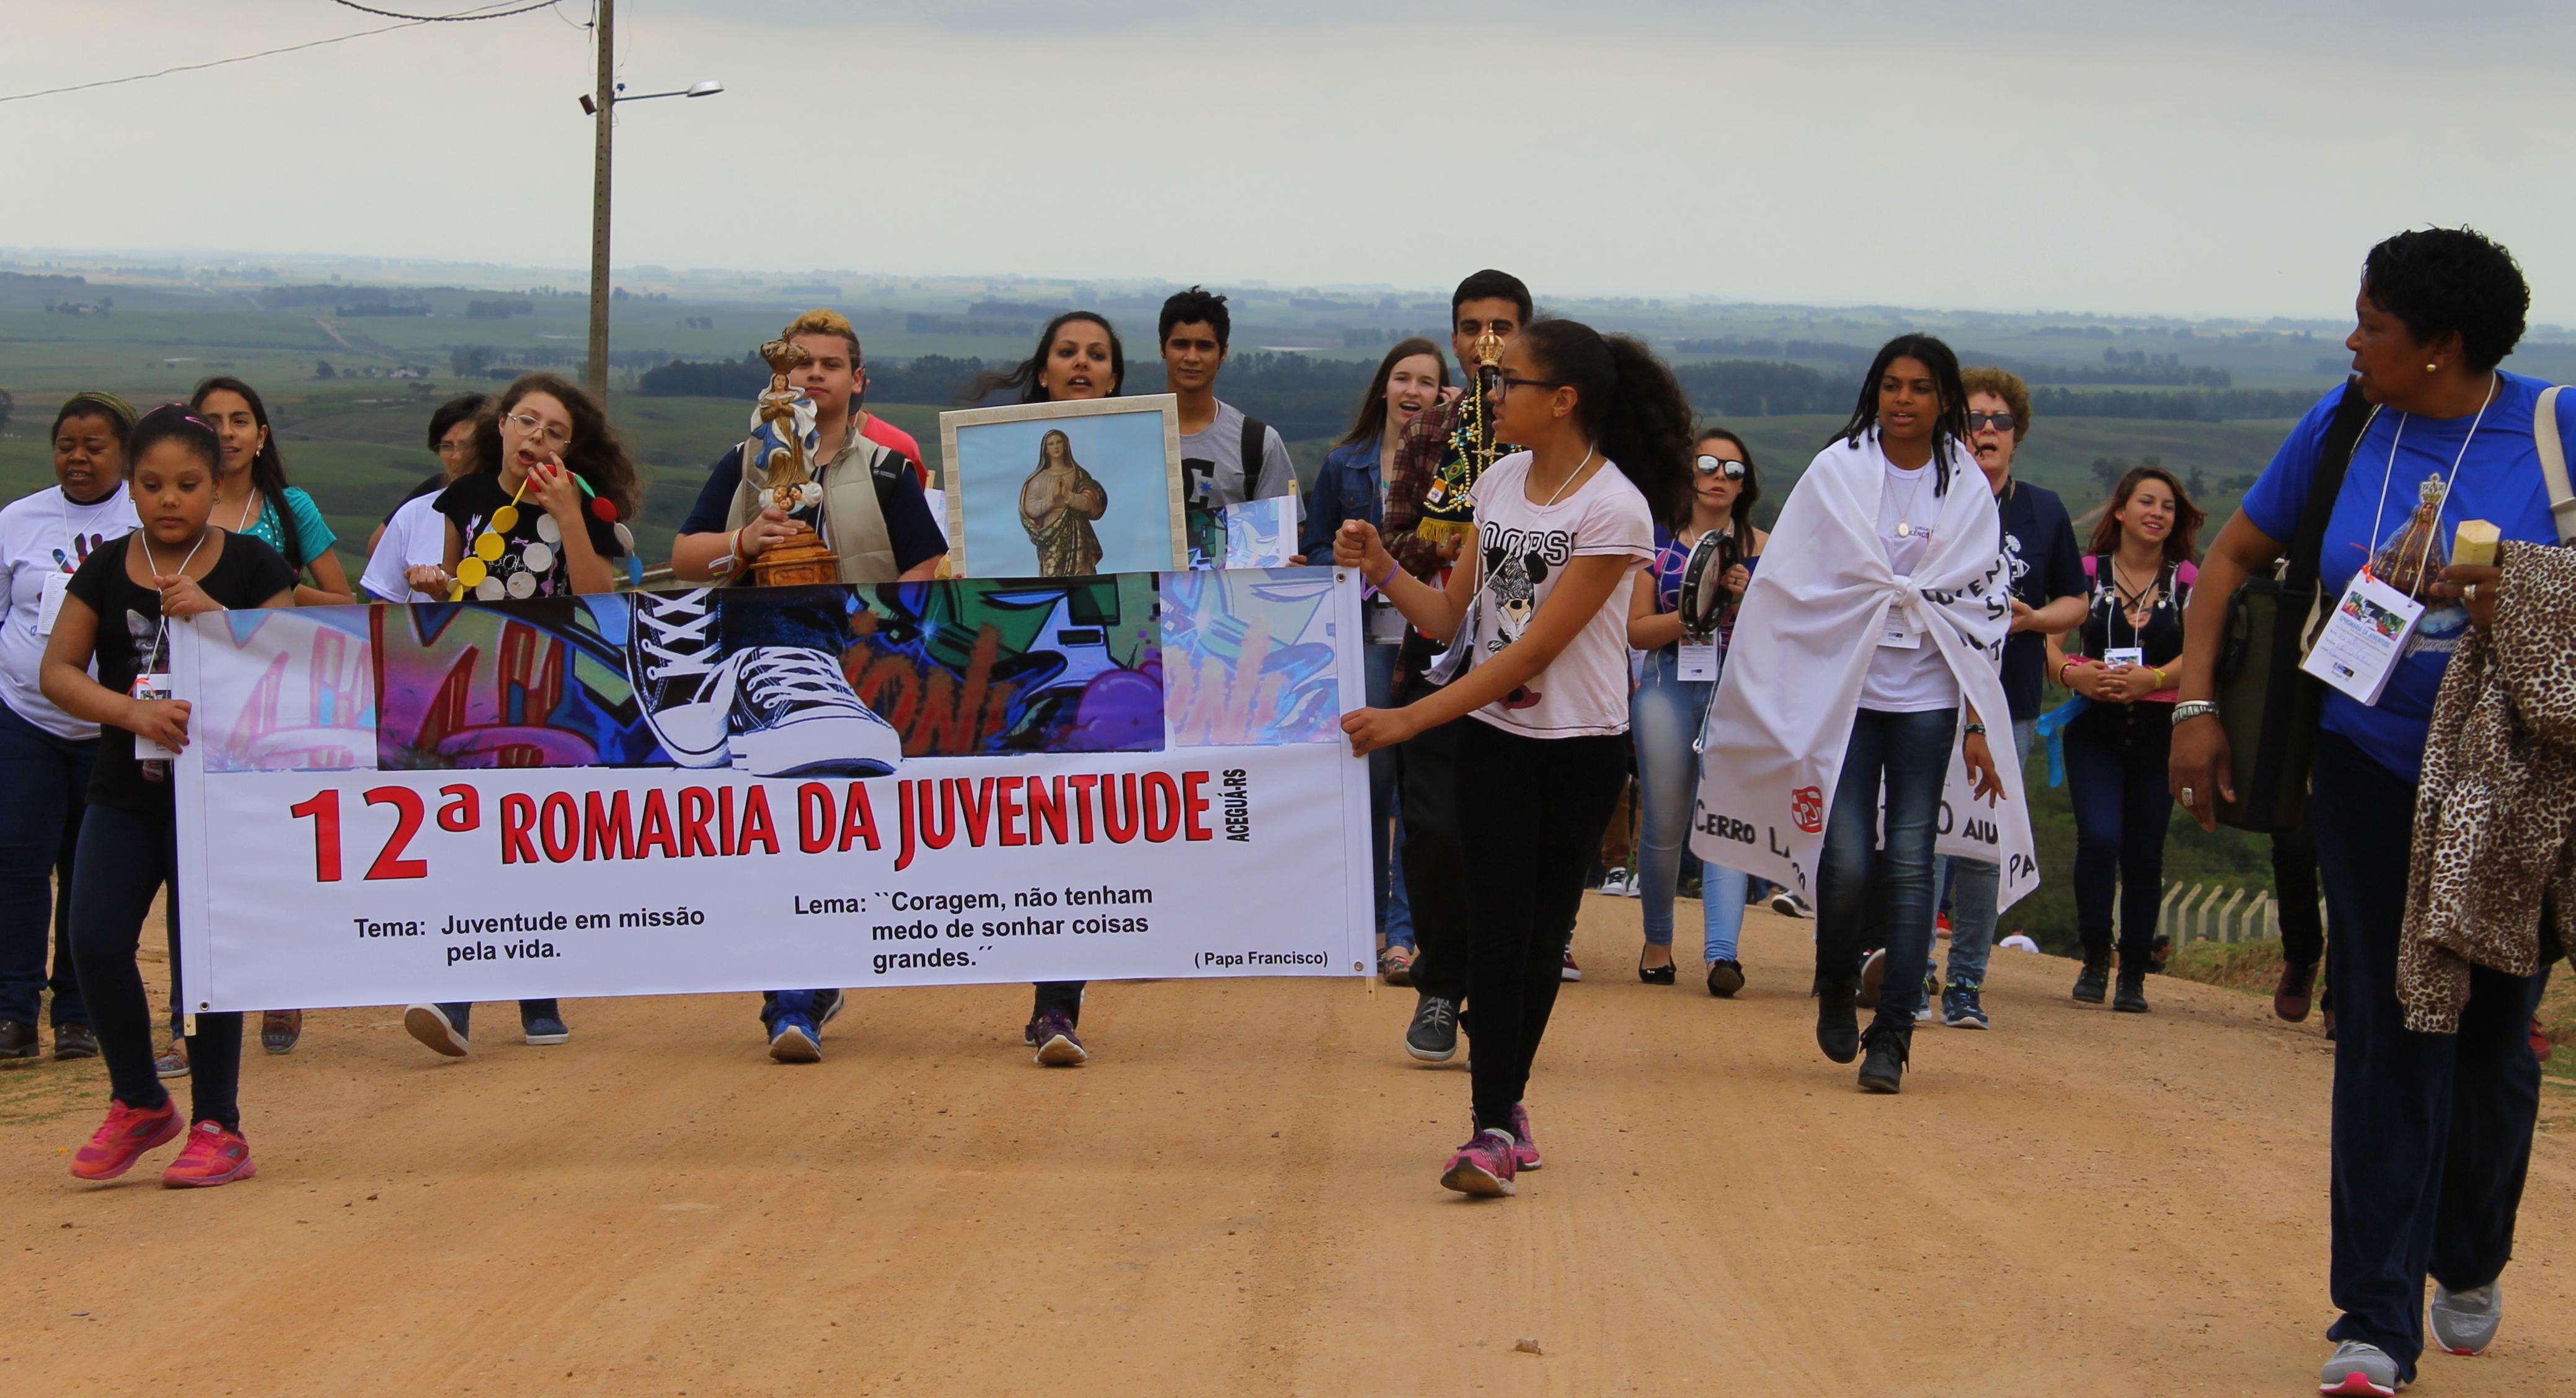 12ª Romaria da Juventude uniu Brasil e Uruguai